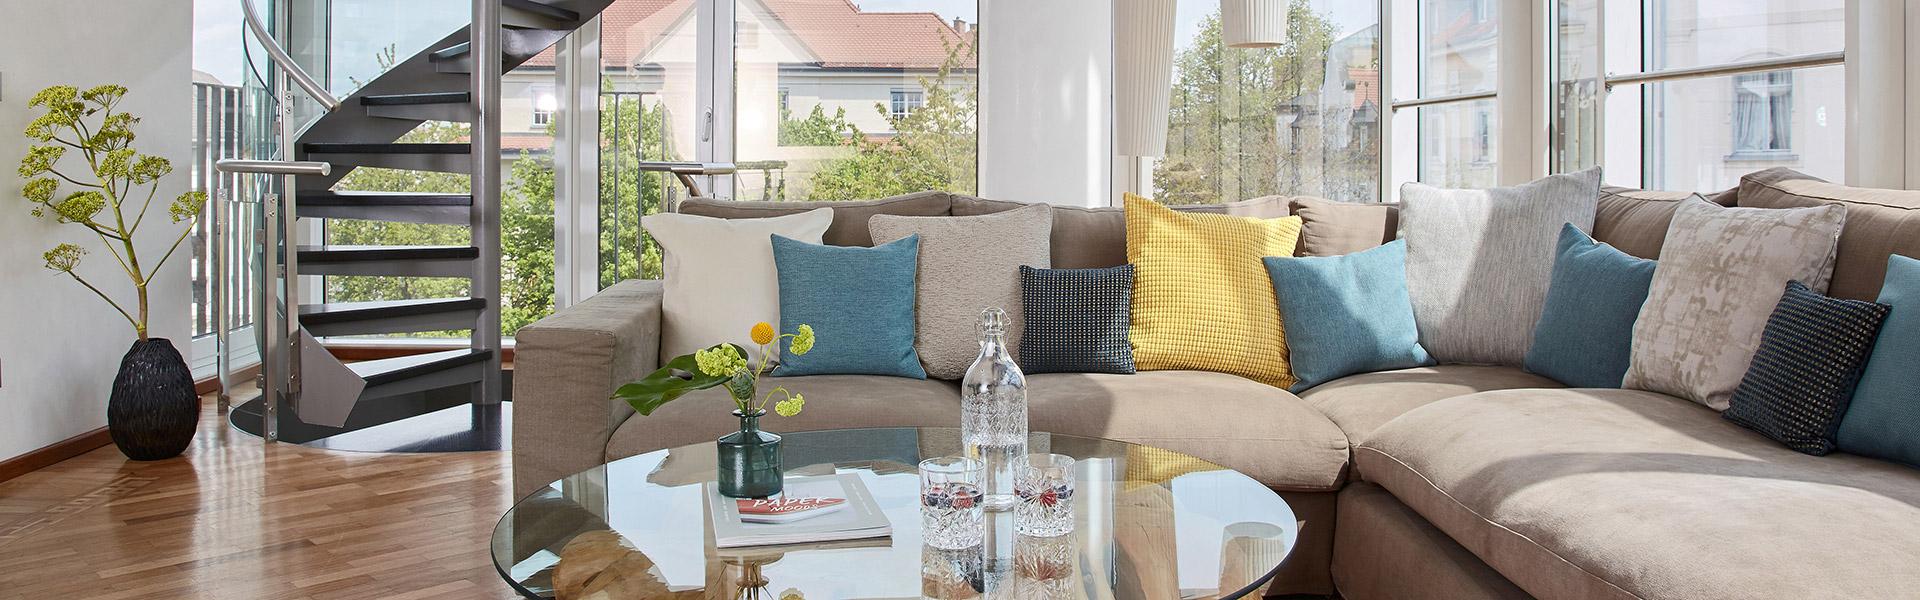 Living Hotel Prinzessin Elisabeth München Penthouse Suite